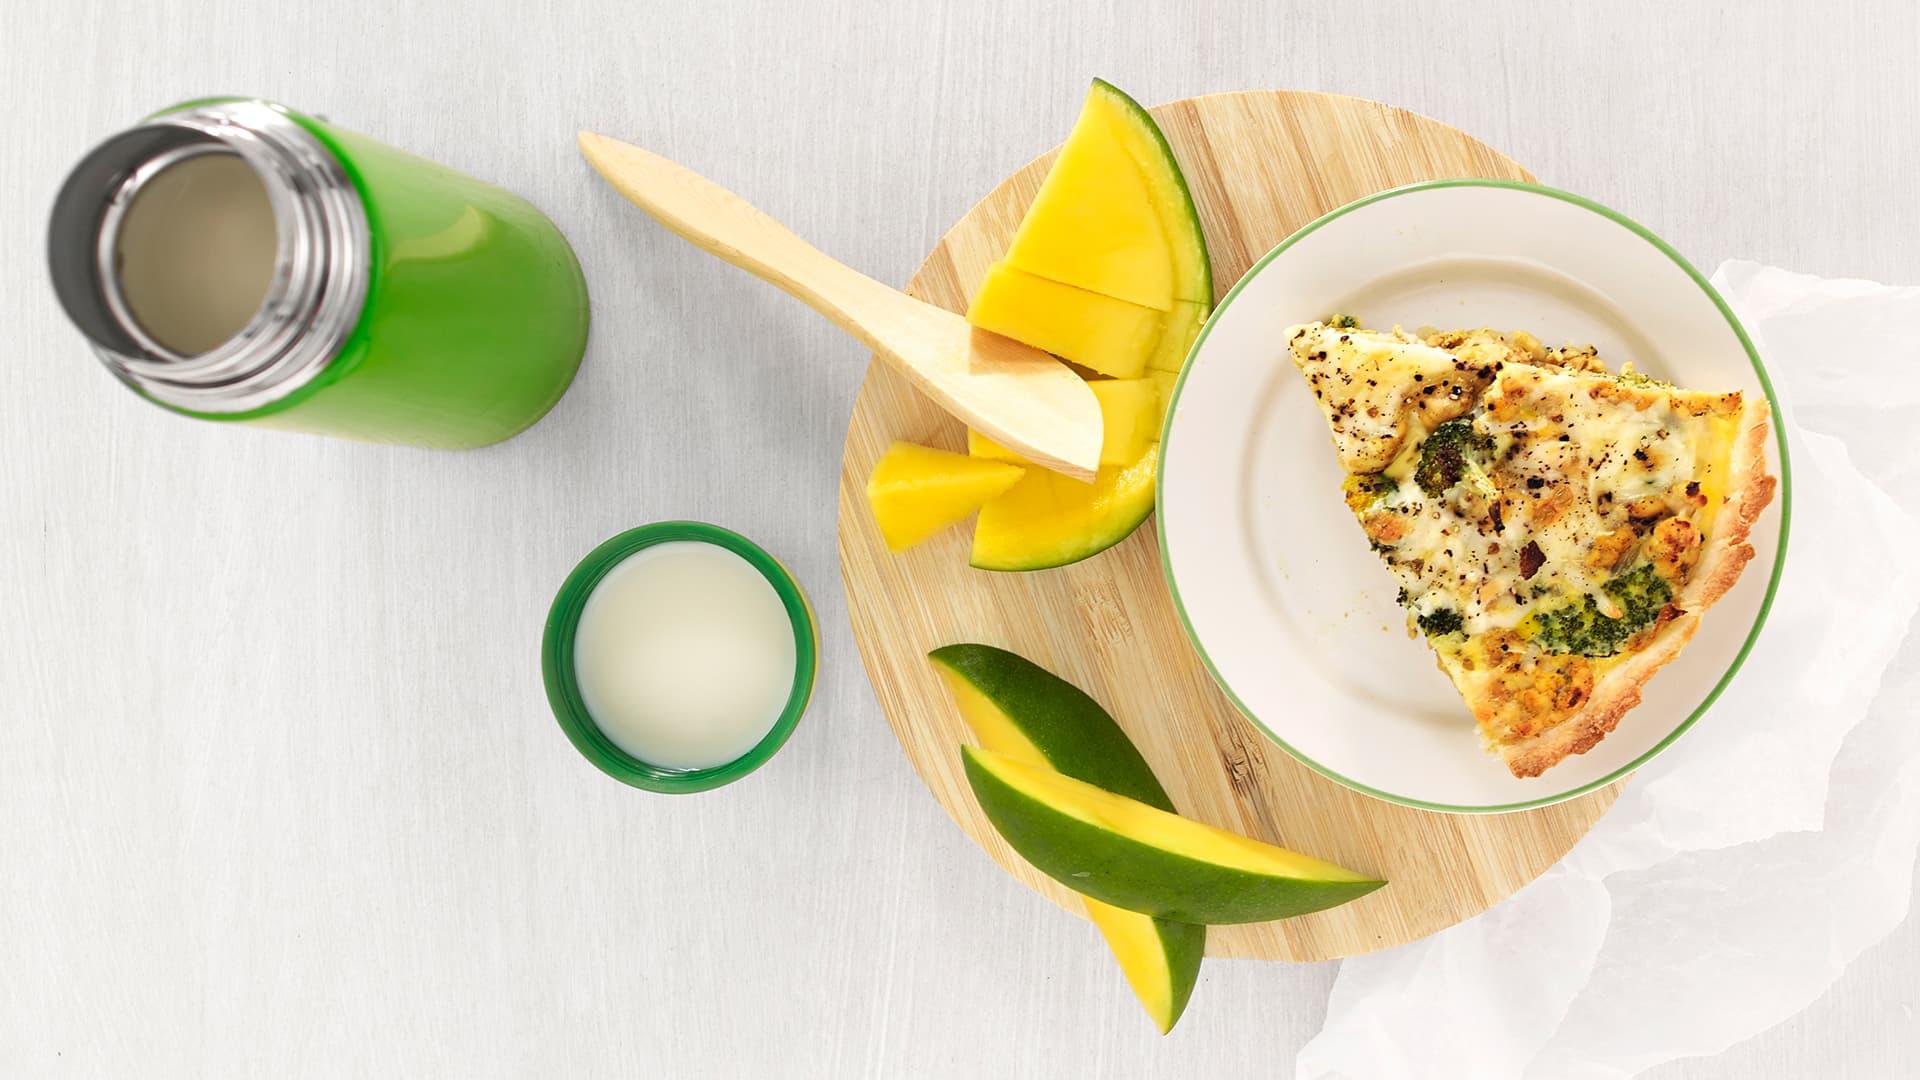 Kyllingpai med brokkoli og løk er perfekt til l lunsj eller i matpakke på jobb og skole. I denne kyllingpaien får du både brokkoli og løk!